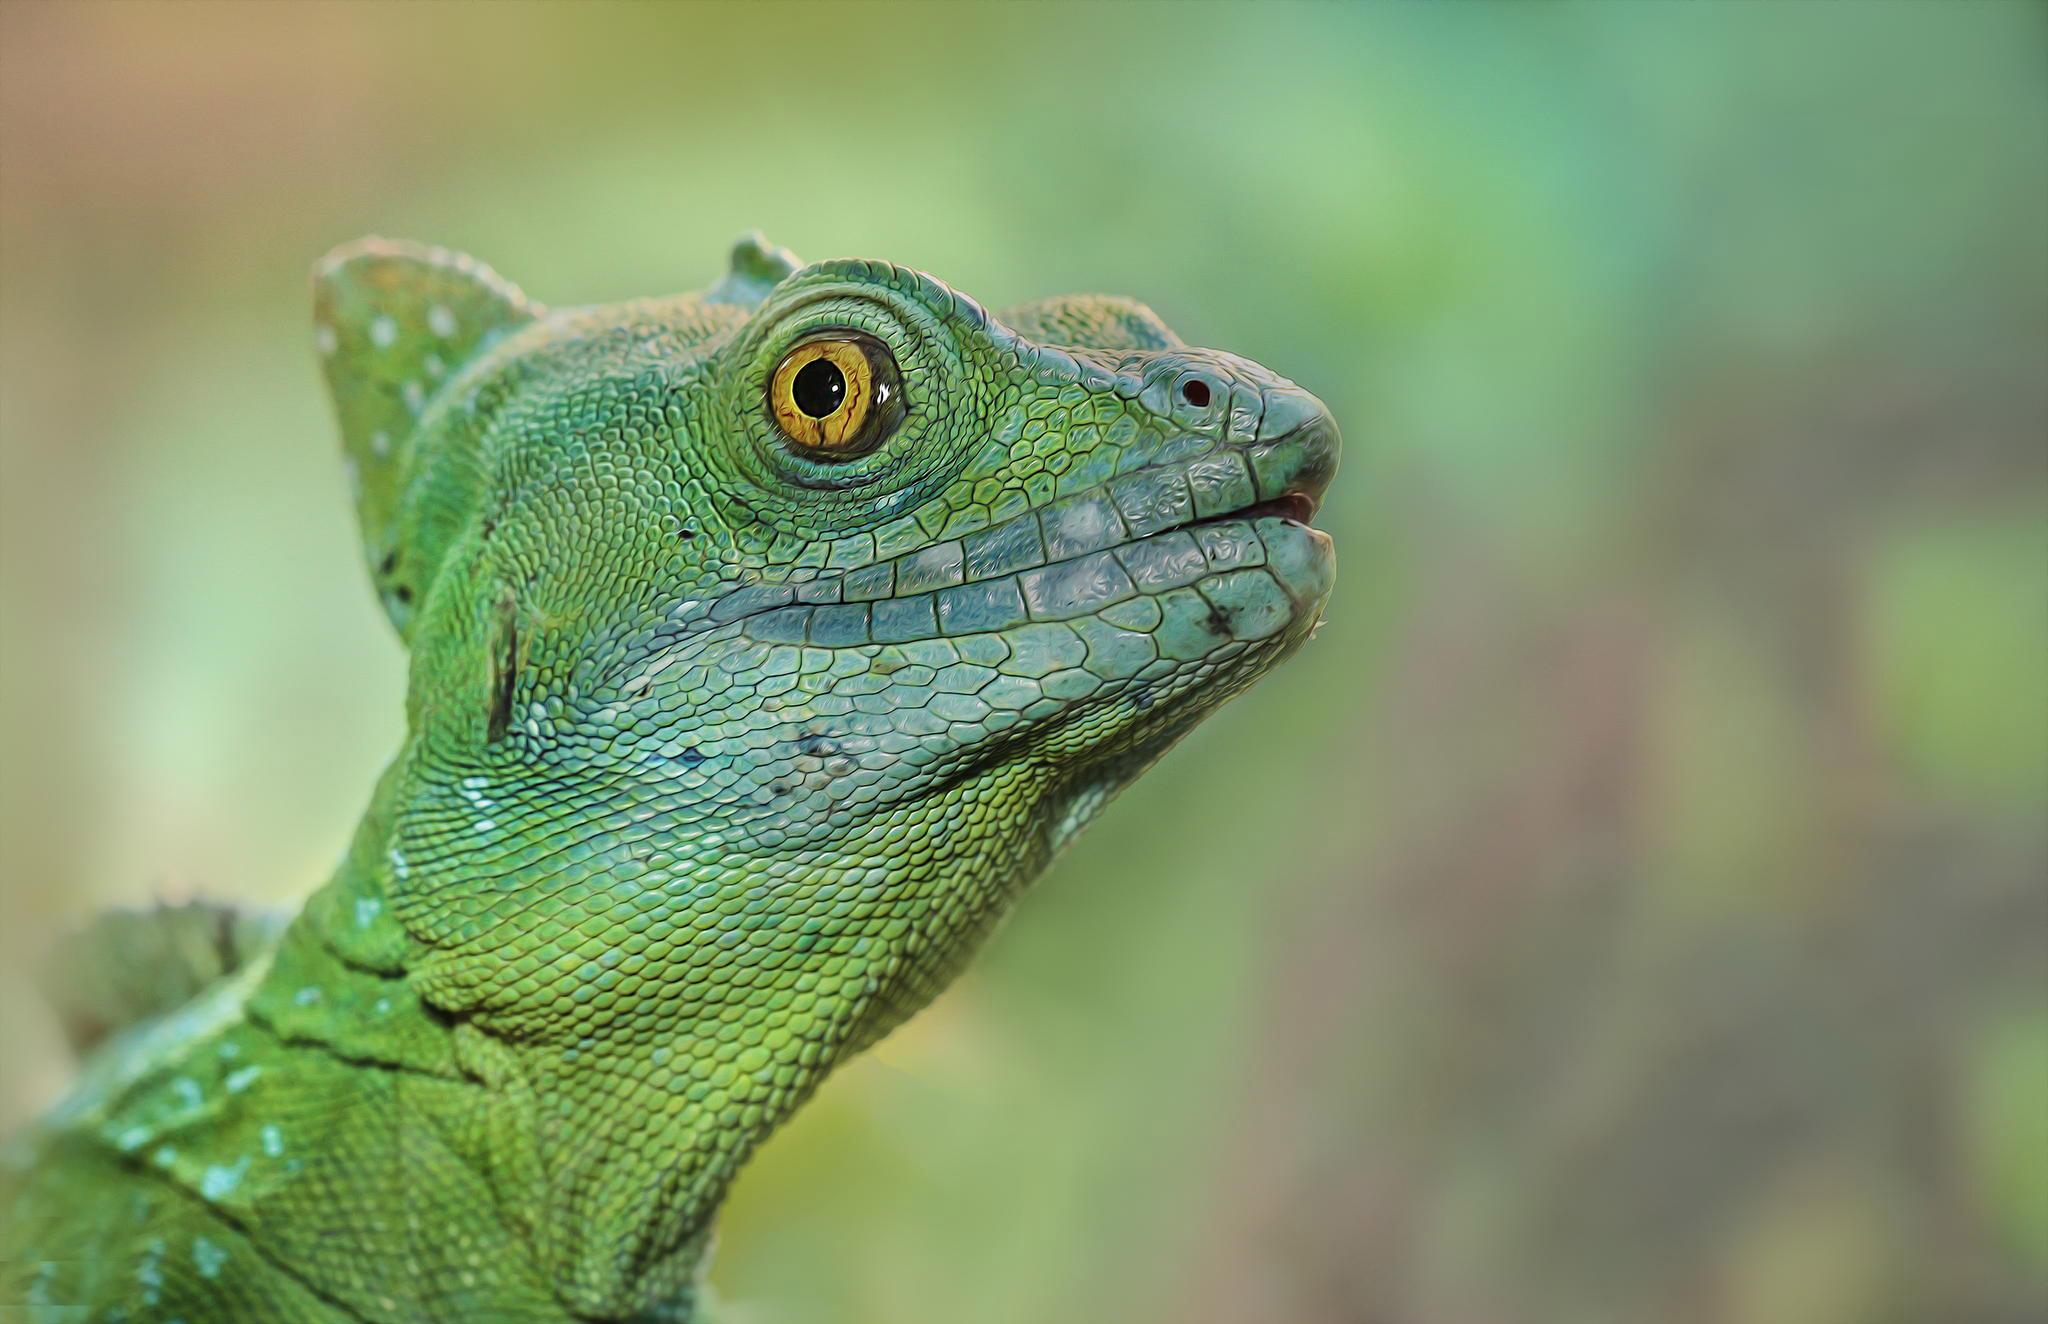 reptiles-amphibians-detlef-knapp-09